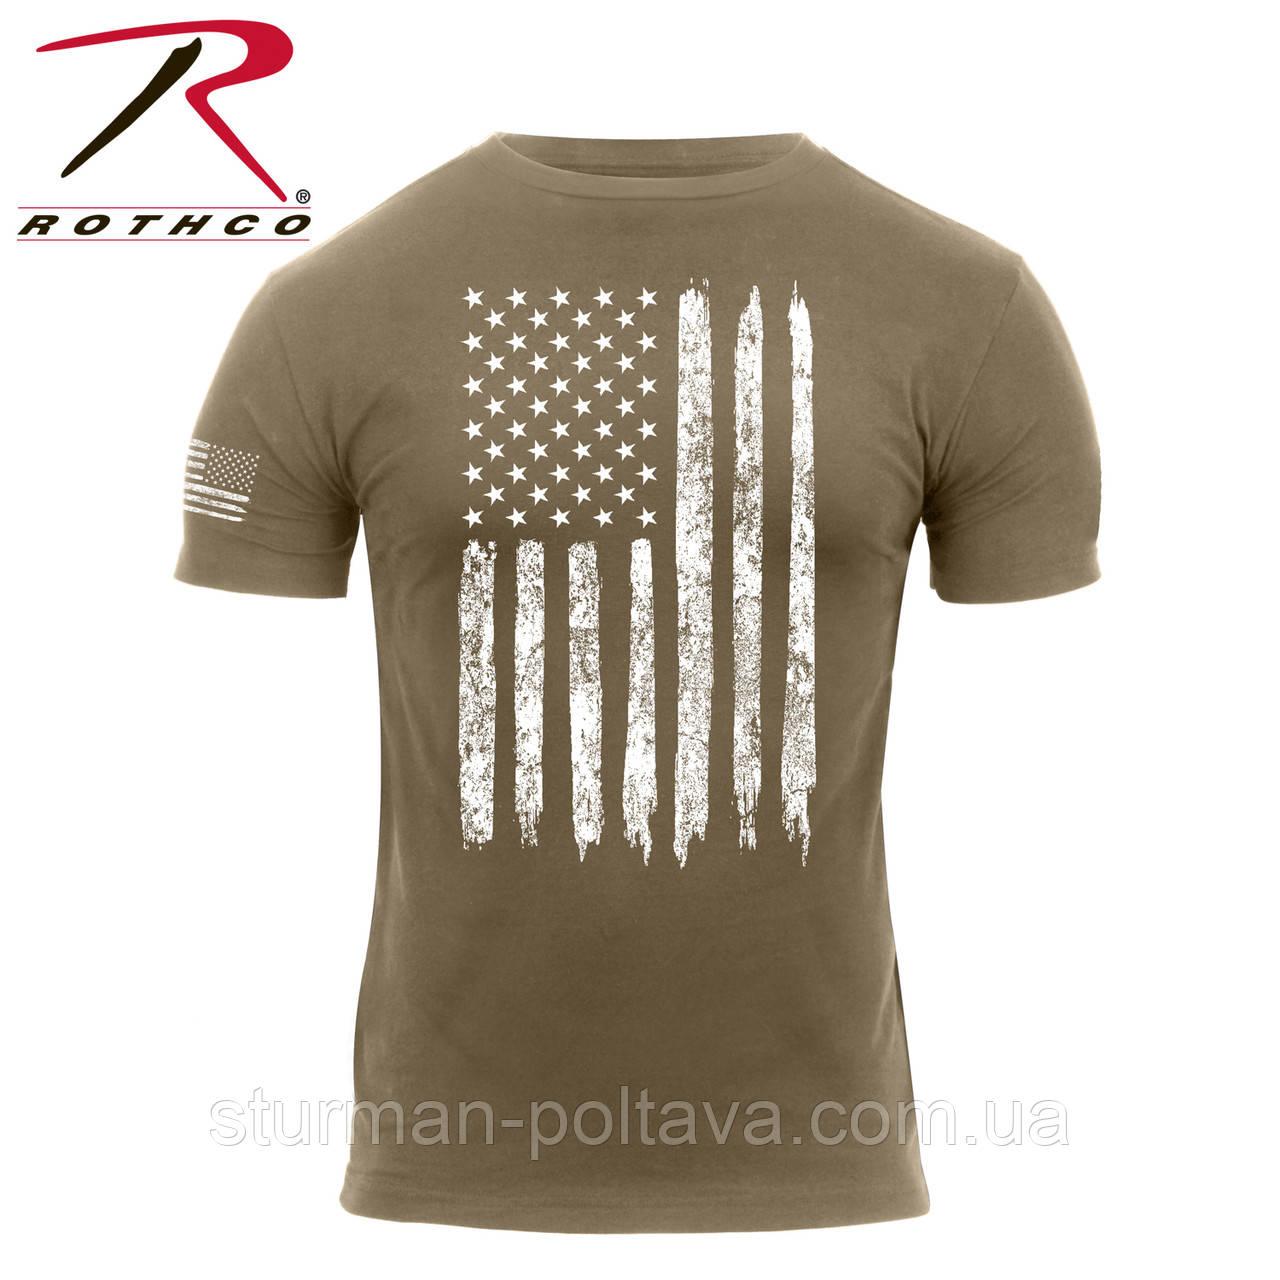 c5db2a76087da Футболка Rothco с флагом США Distressed US Flag Athletic Fit T-Shirt Coyote  - Магазин